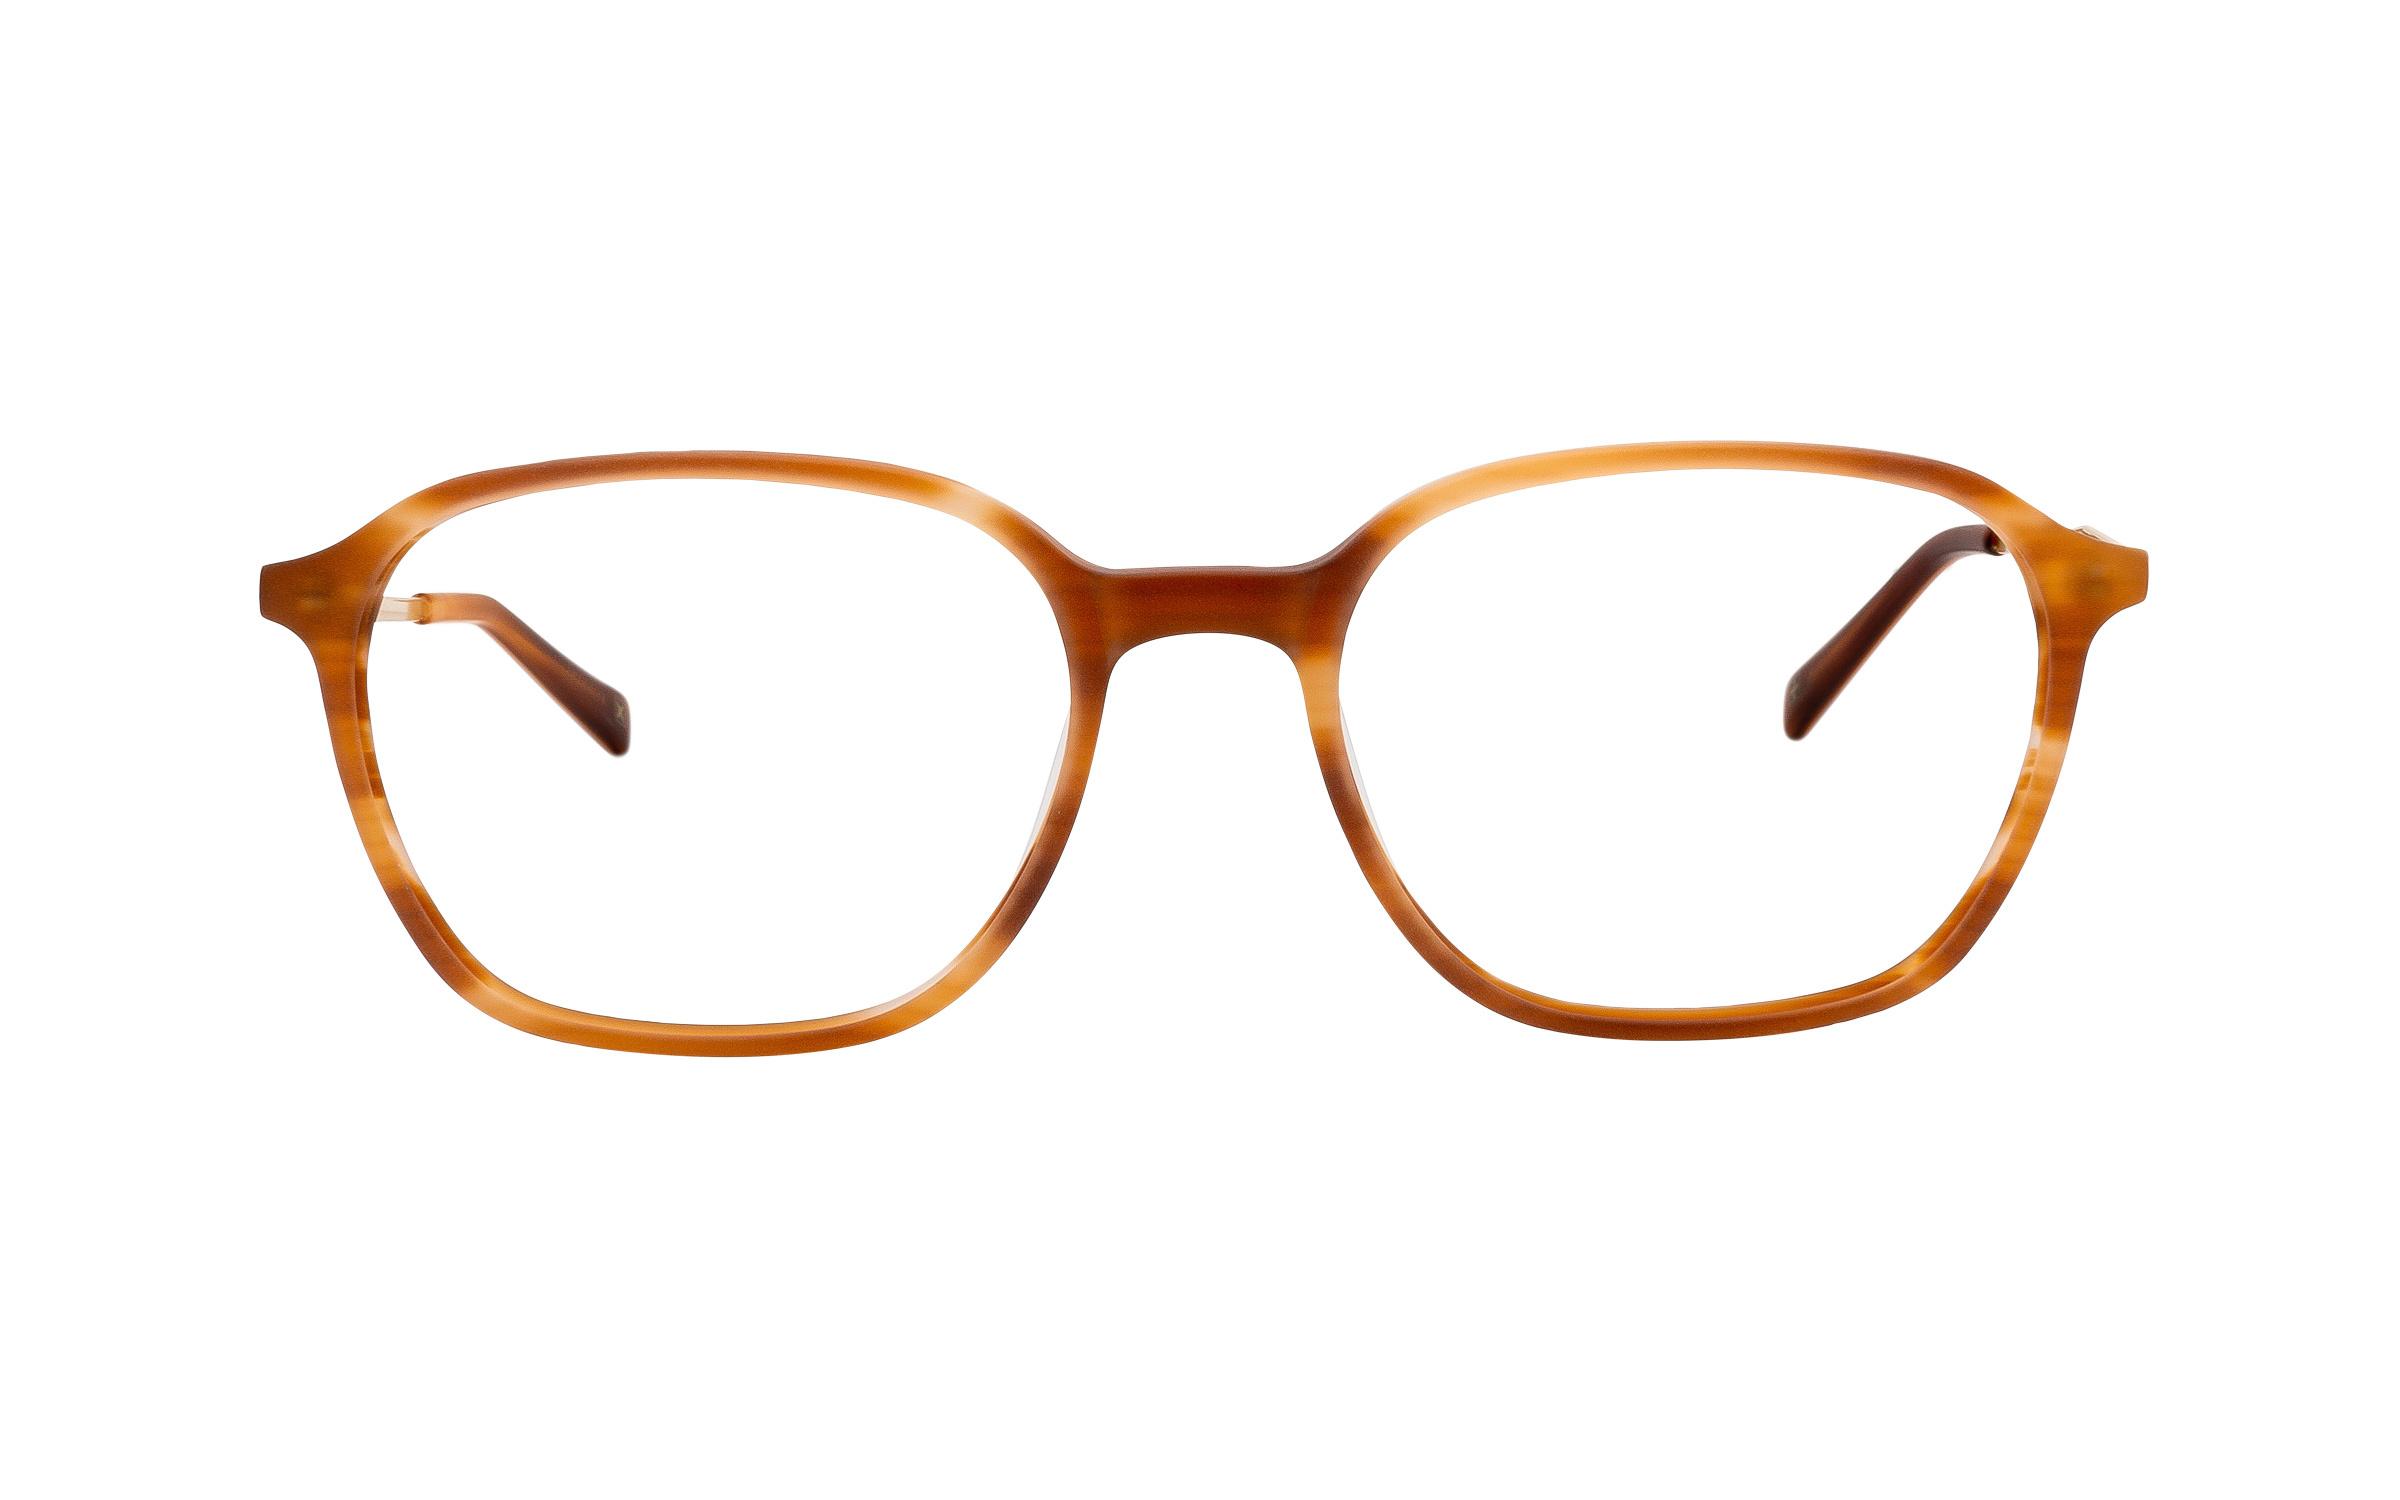 http://www.coastal.com/ - Derek Cardigan Caelum DC236 C03 (53) Eyeglasses and Frame in Matte Horn Orange | Acetate – Online Coastal